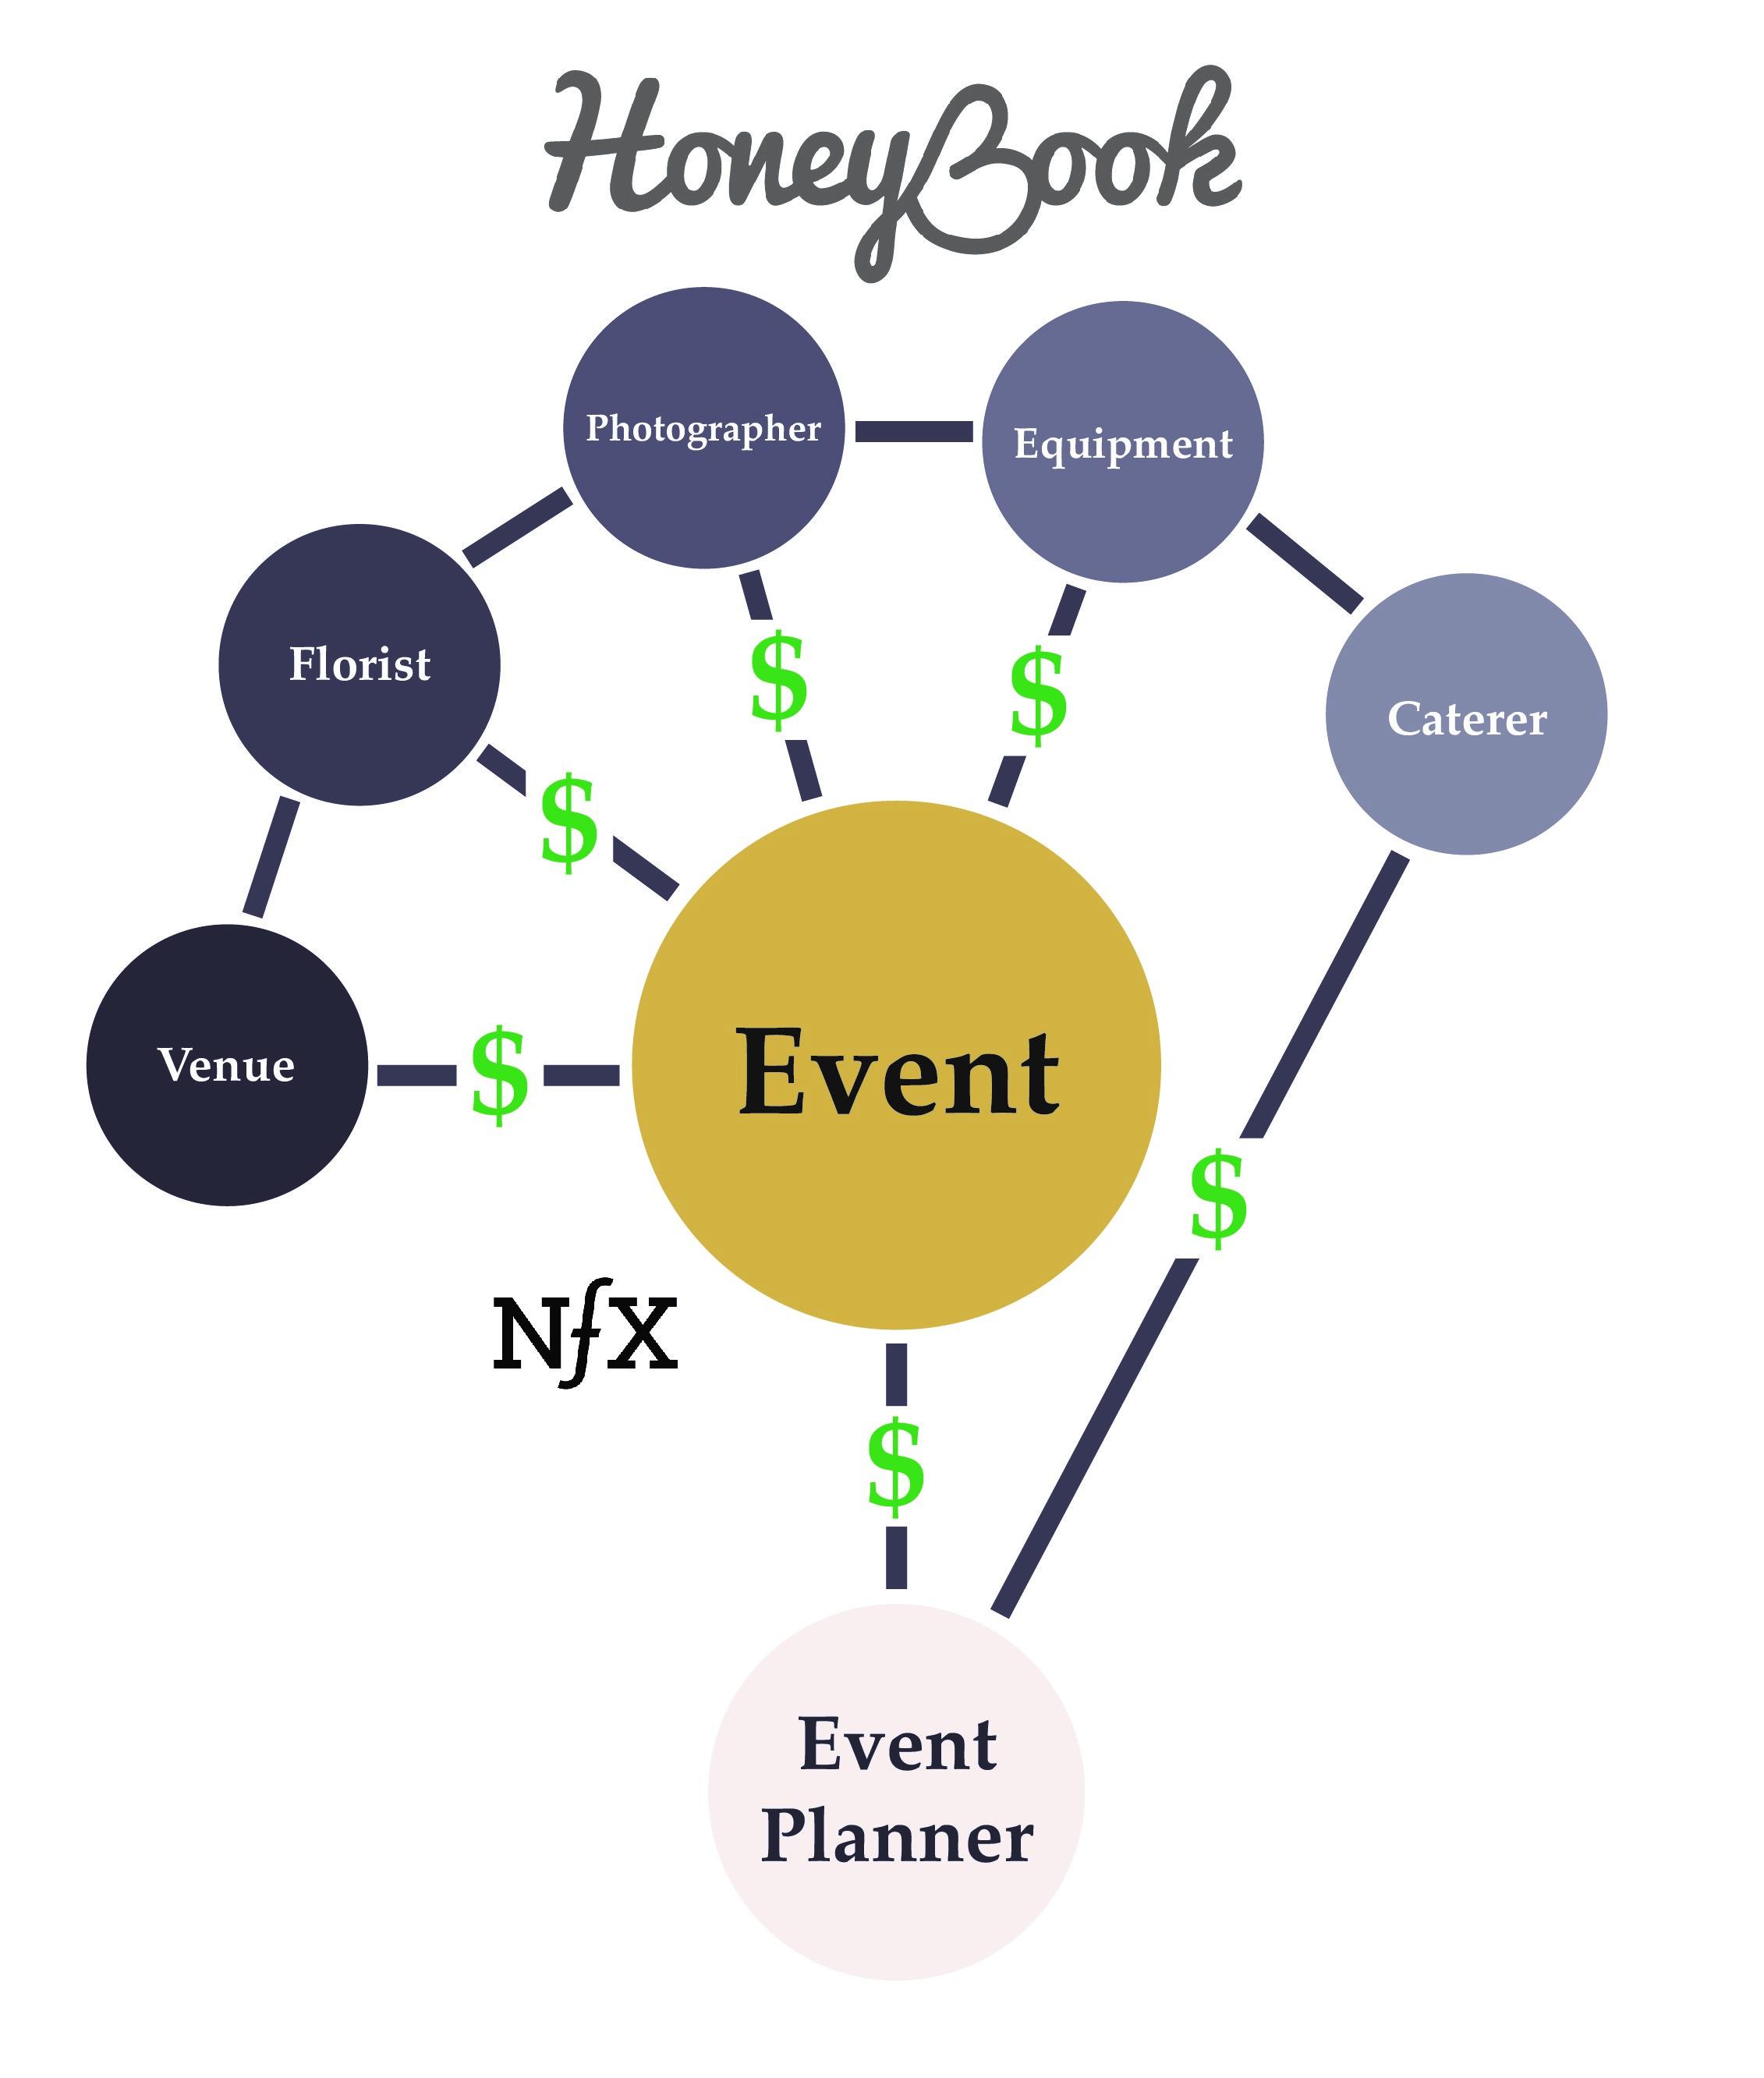 Market-Network-Companies-honeybook